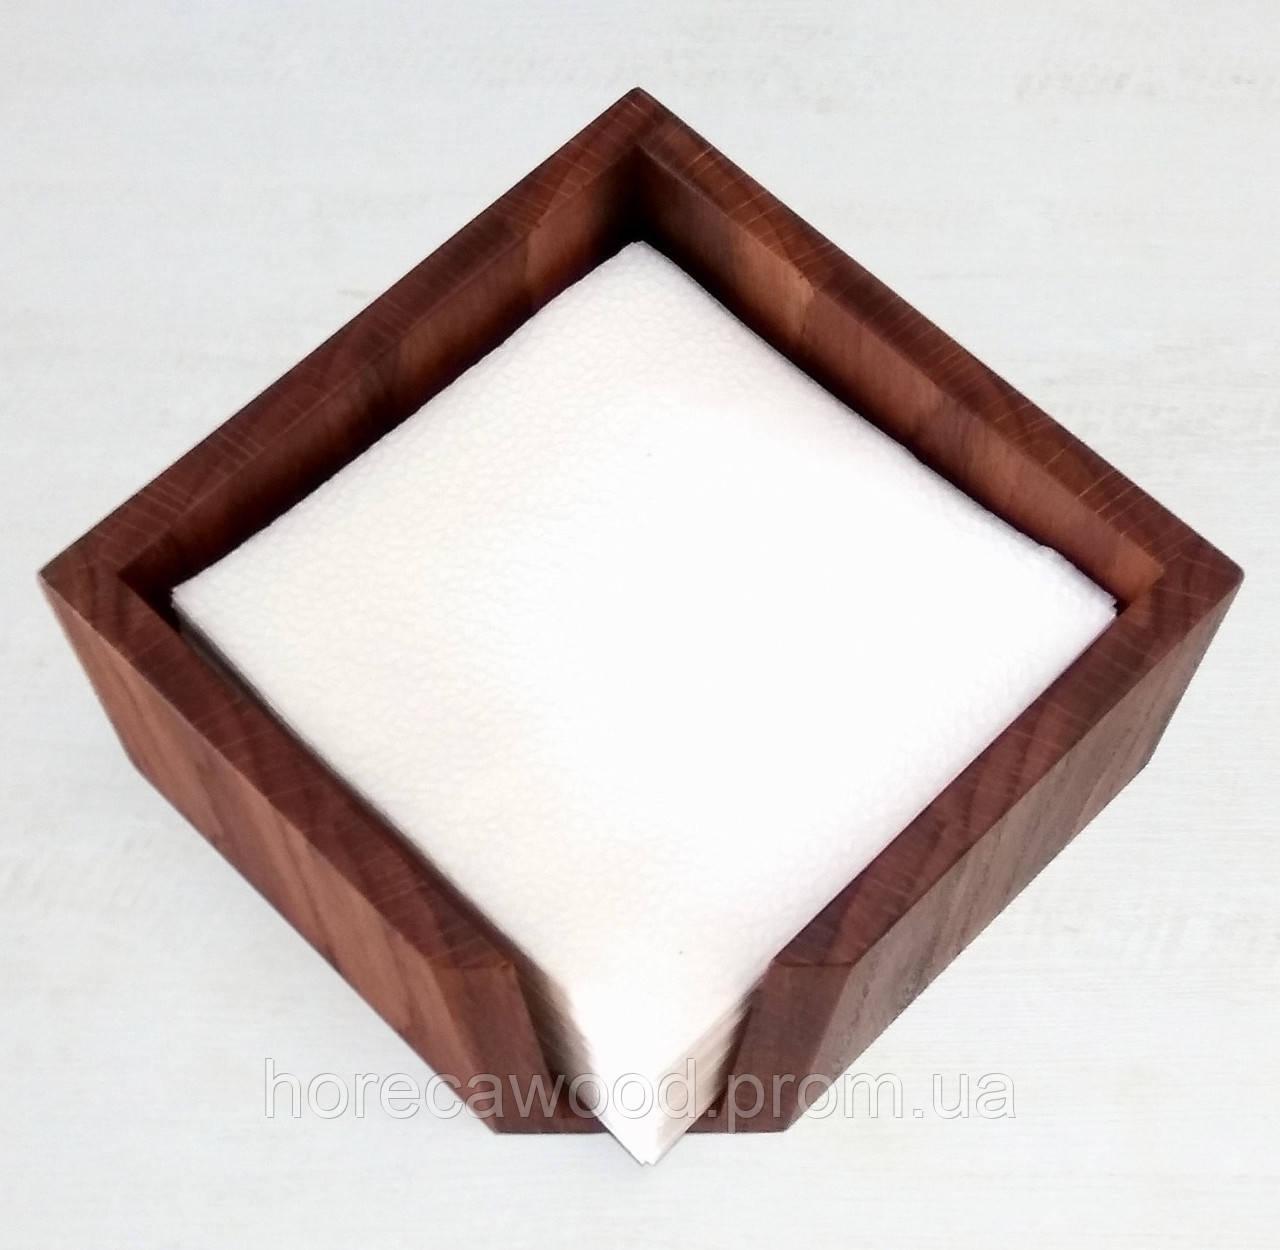 Салфетница деревянная дубовая 145х145х80мм